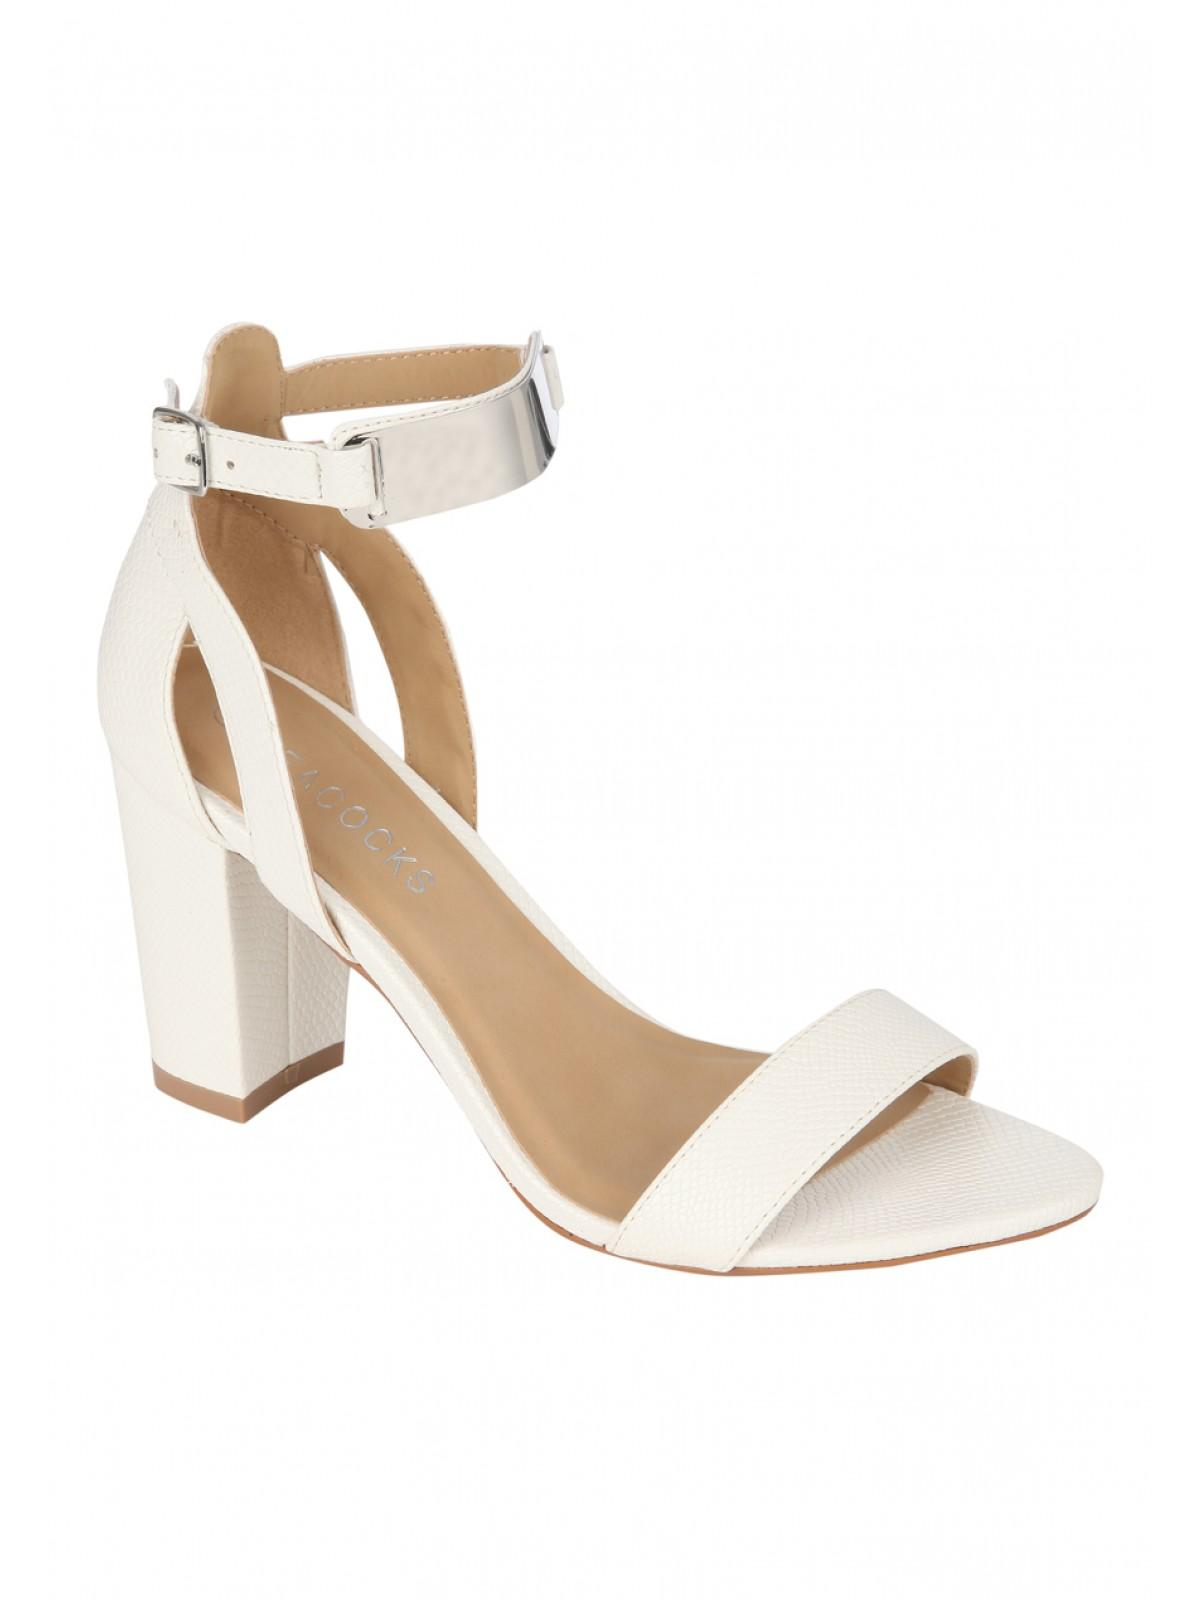 Sandales À Talons Bloc Blanc Glamour - Blanc 7IK5m